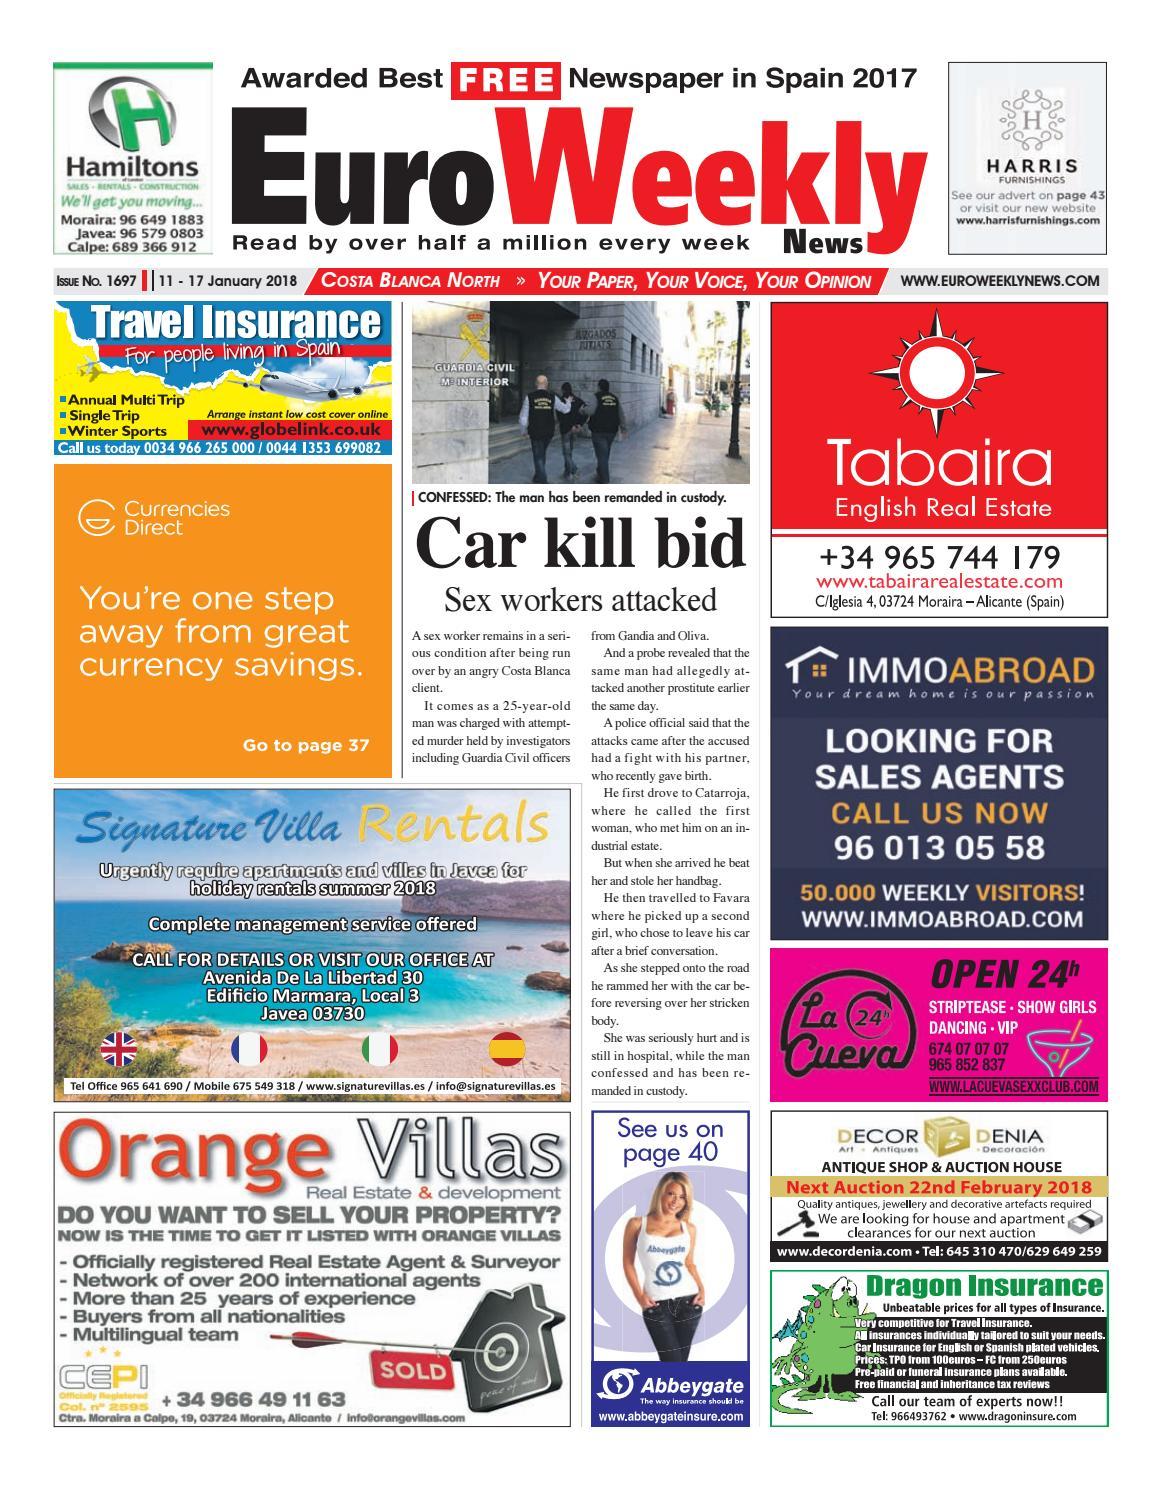 Euro Weekly News Costa Blanca North 11 17 Jan 2018 Issue 1697  # Muebles Boom Vitoria